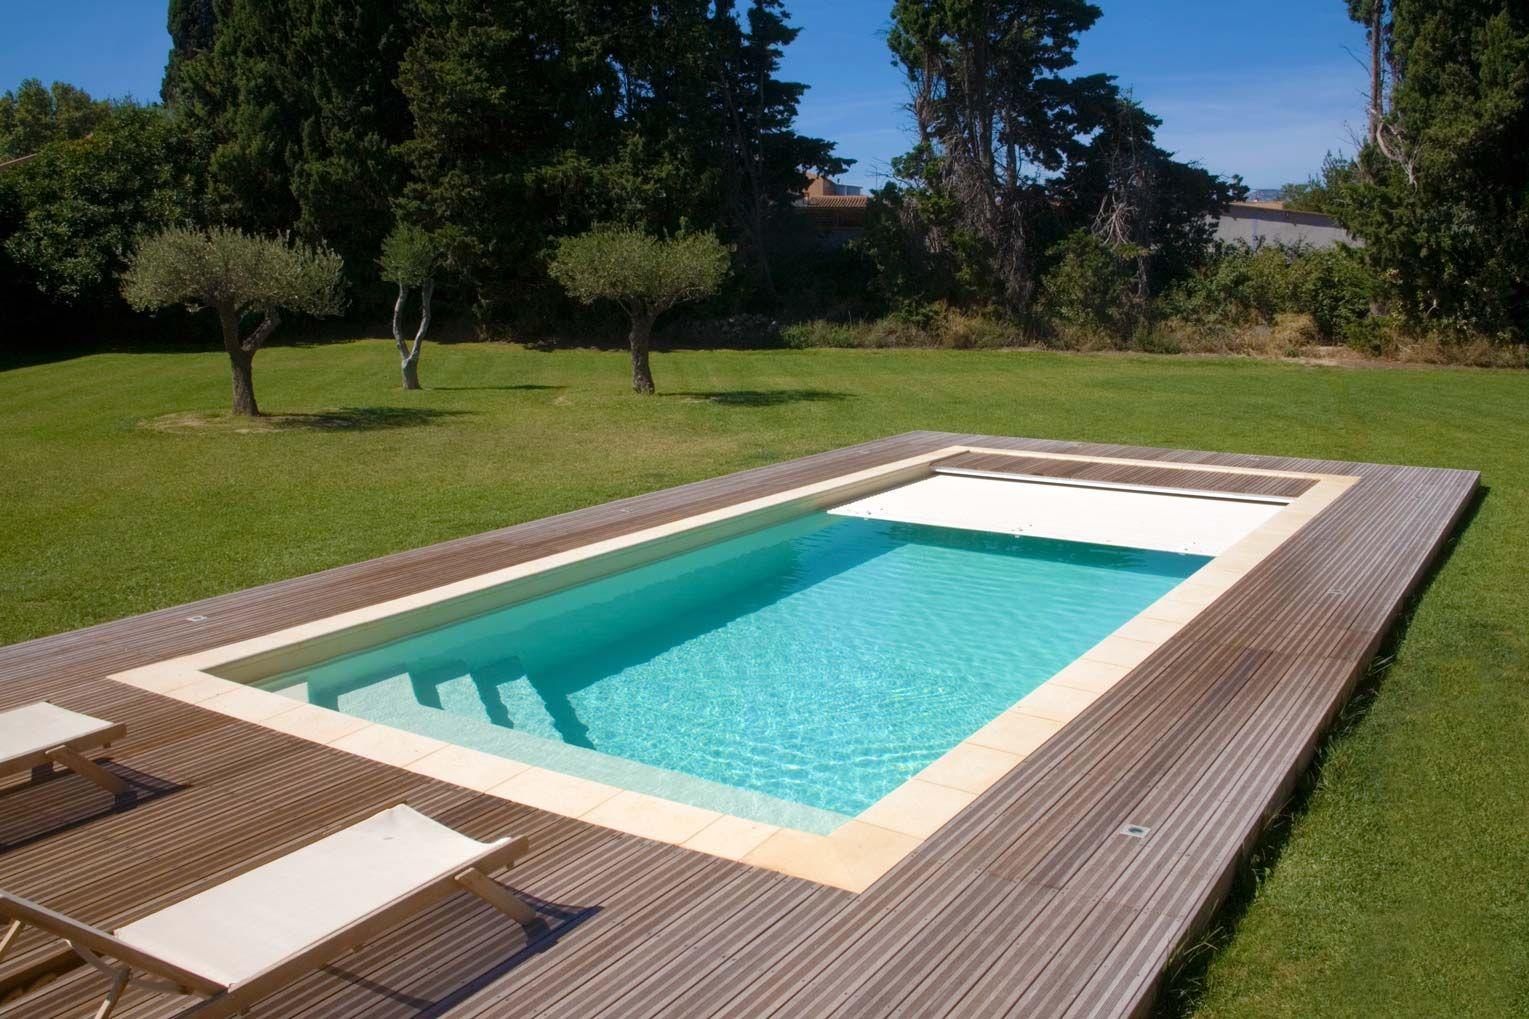 comores piscine couverture immerg e fond plat zwembad pinterest peque as piscinas. Black Bedroom Furniture Sets. Home Design Ideas